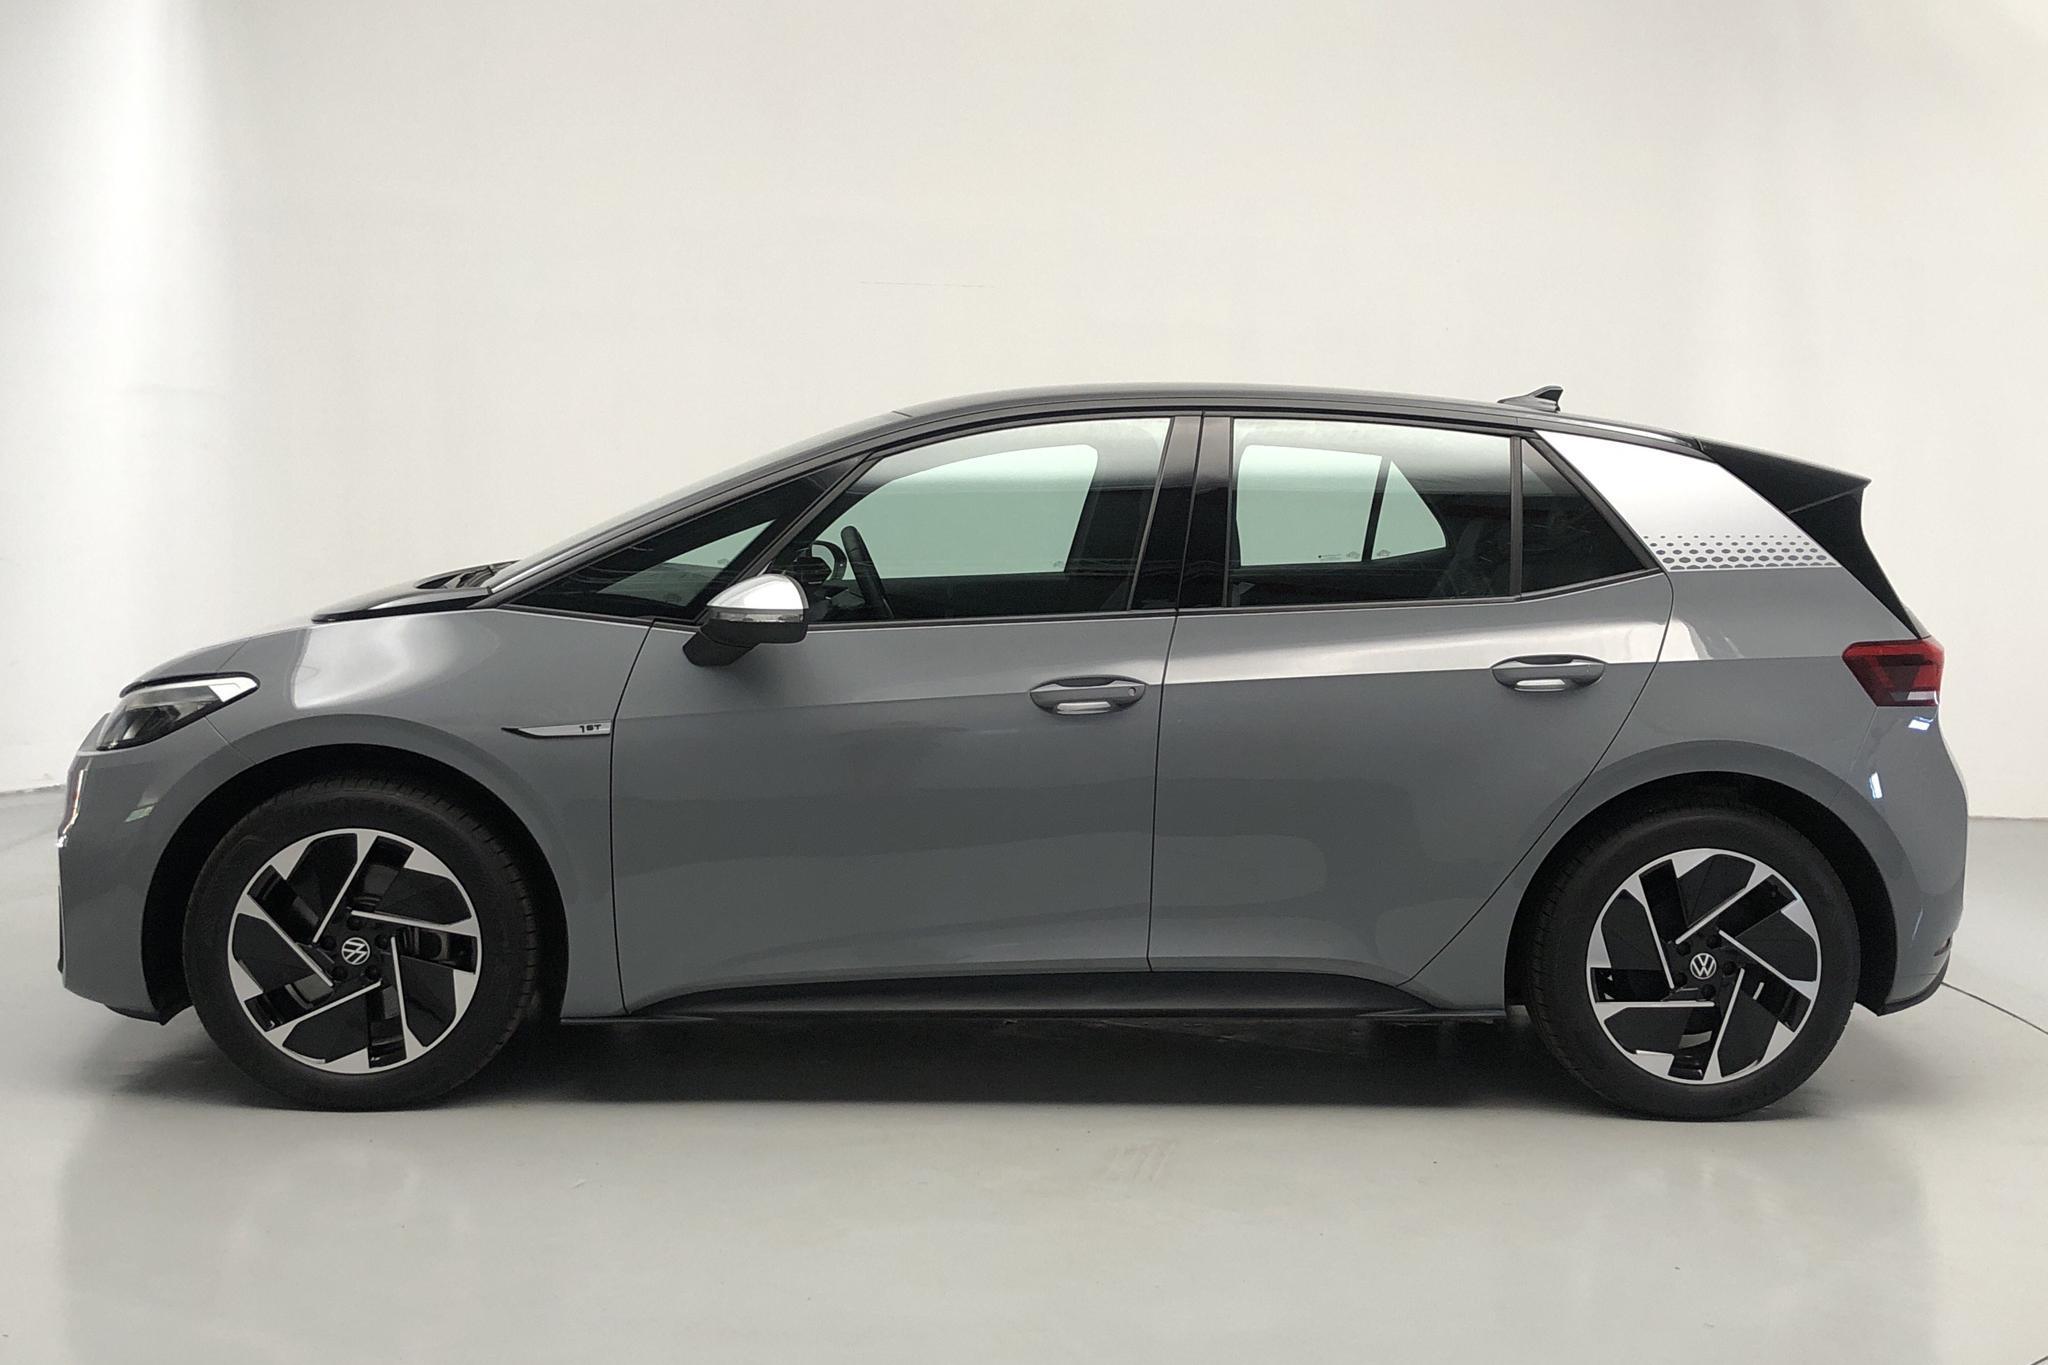 VW ID.3 58kWh (204hk) - 6 100 km - Automatic - gray - 2021